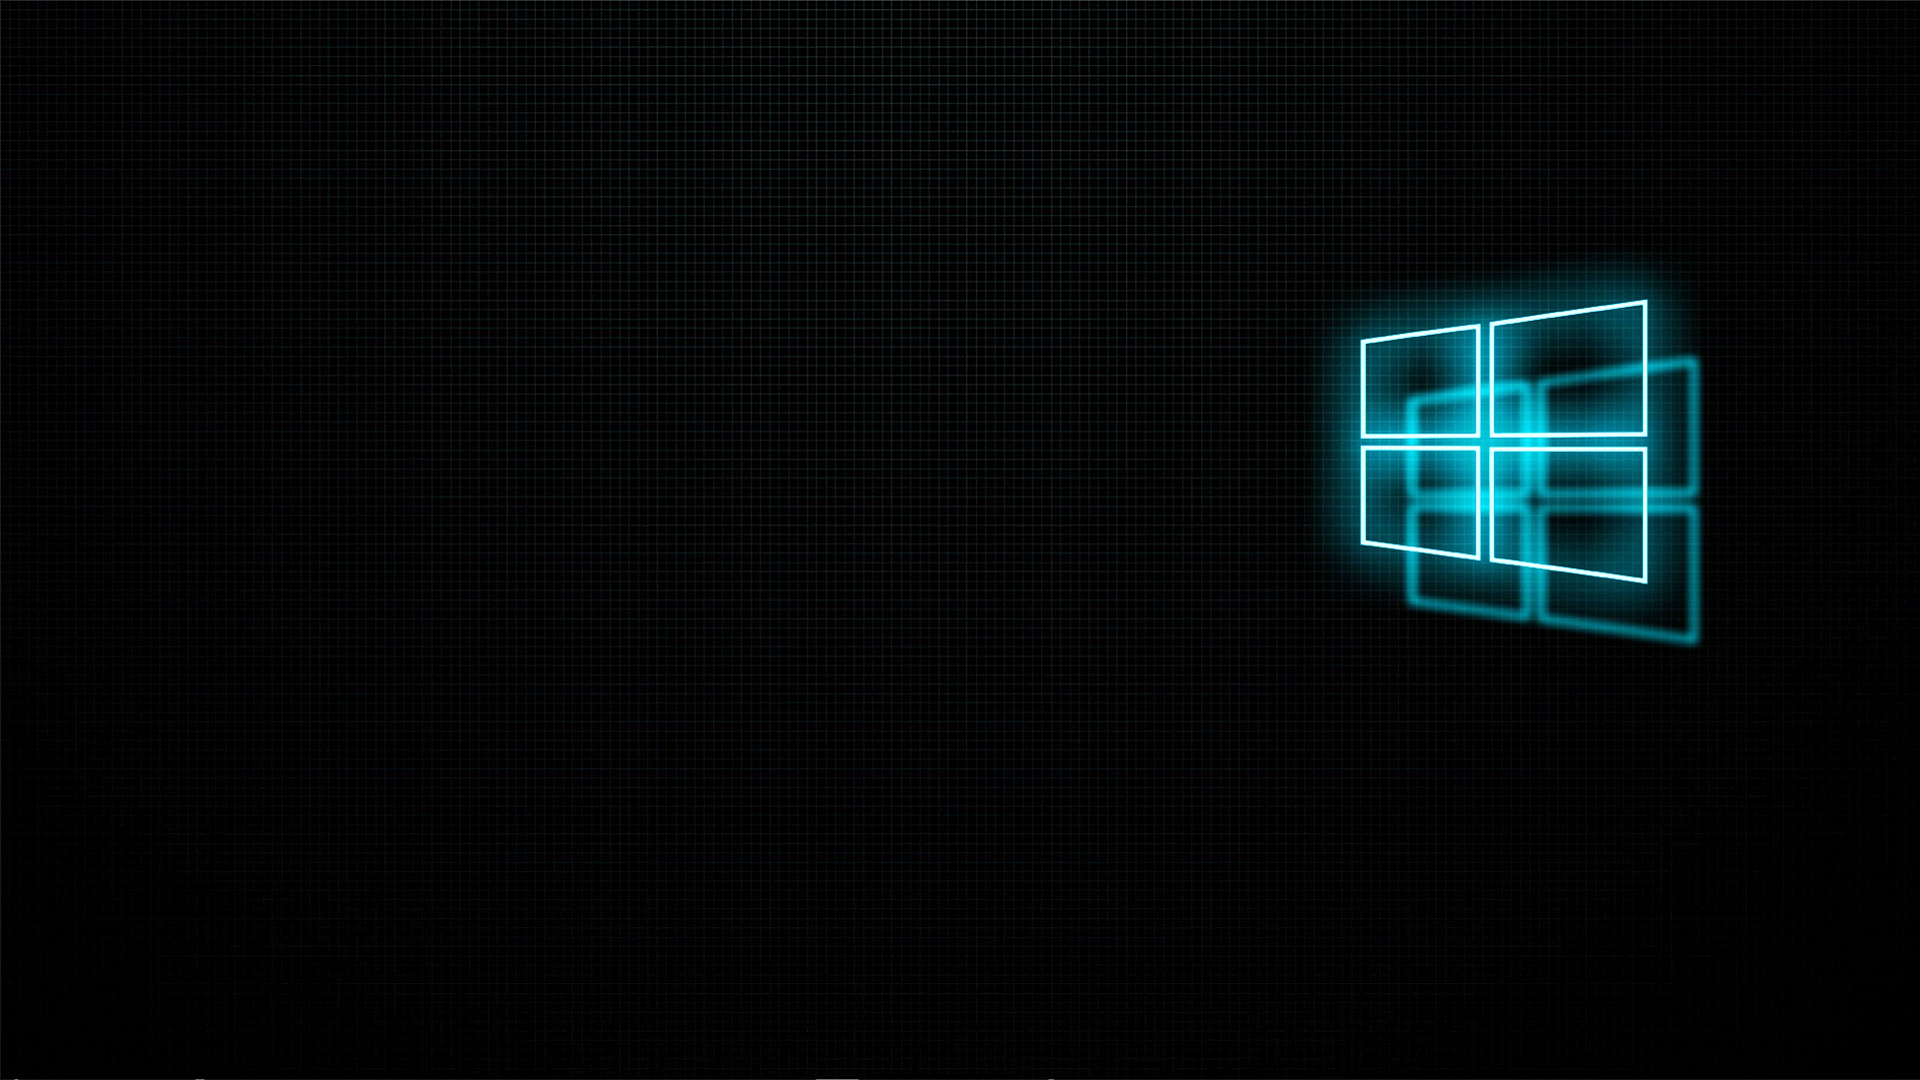 Windows 10 Glowing Logo 1920x1080 Active Wallpaper Windows 10 Windows 10 Logo